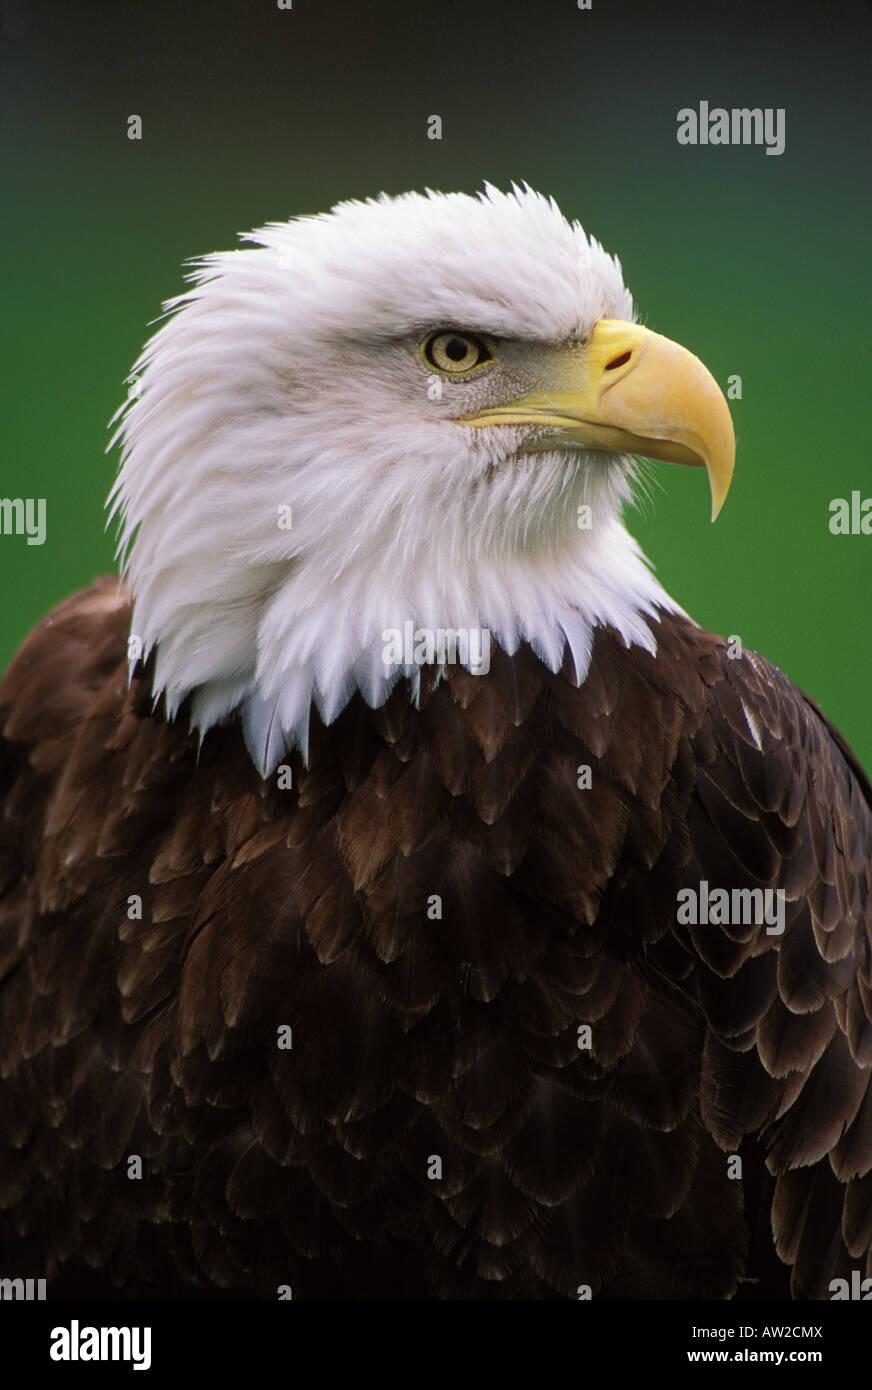 A bald eagle attentively surveys his surroundings - Stock Image